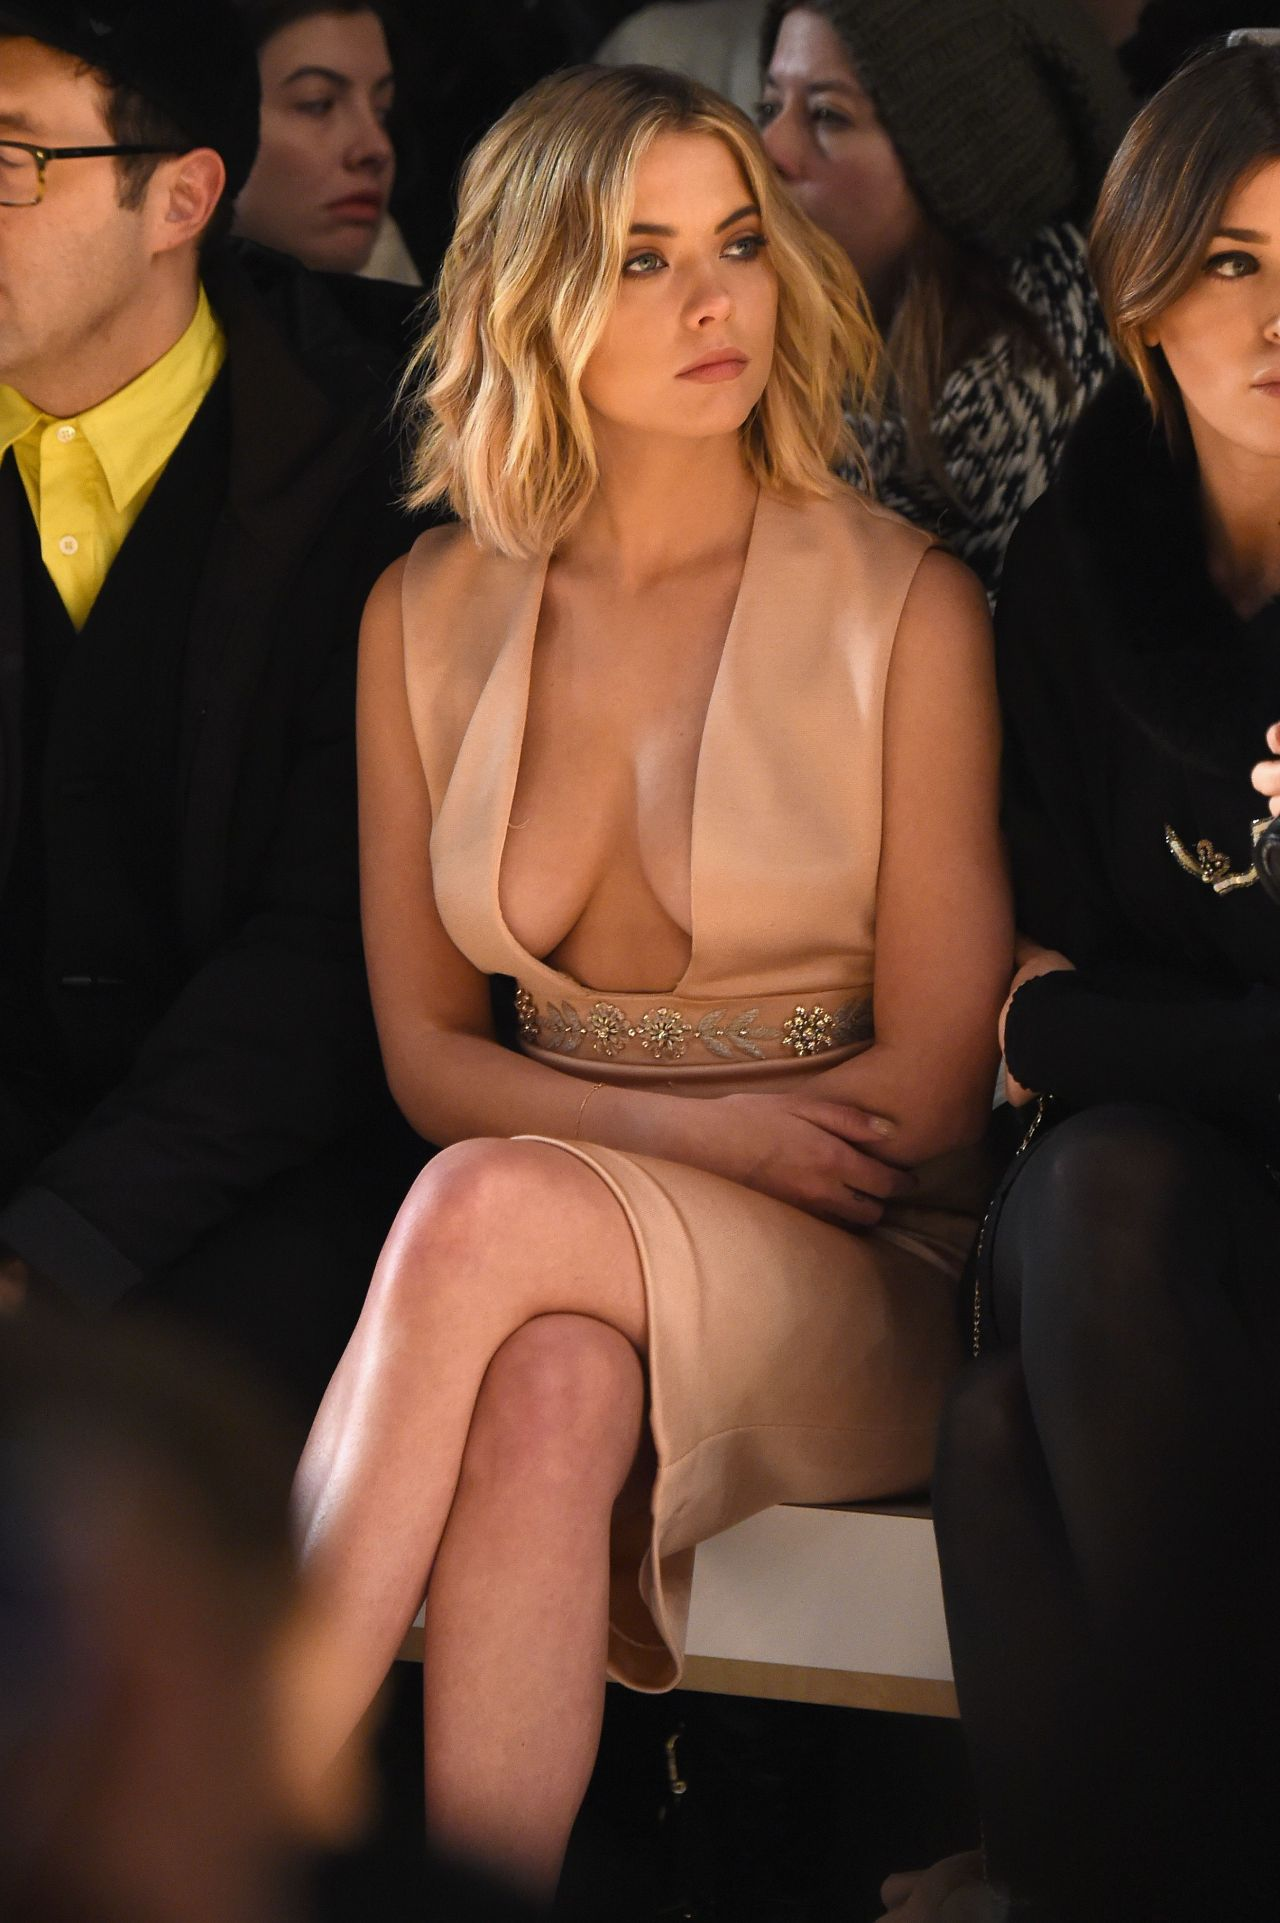 paige small tits spread